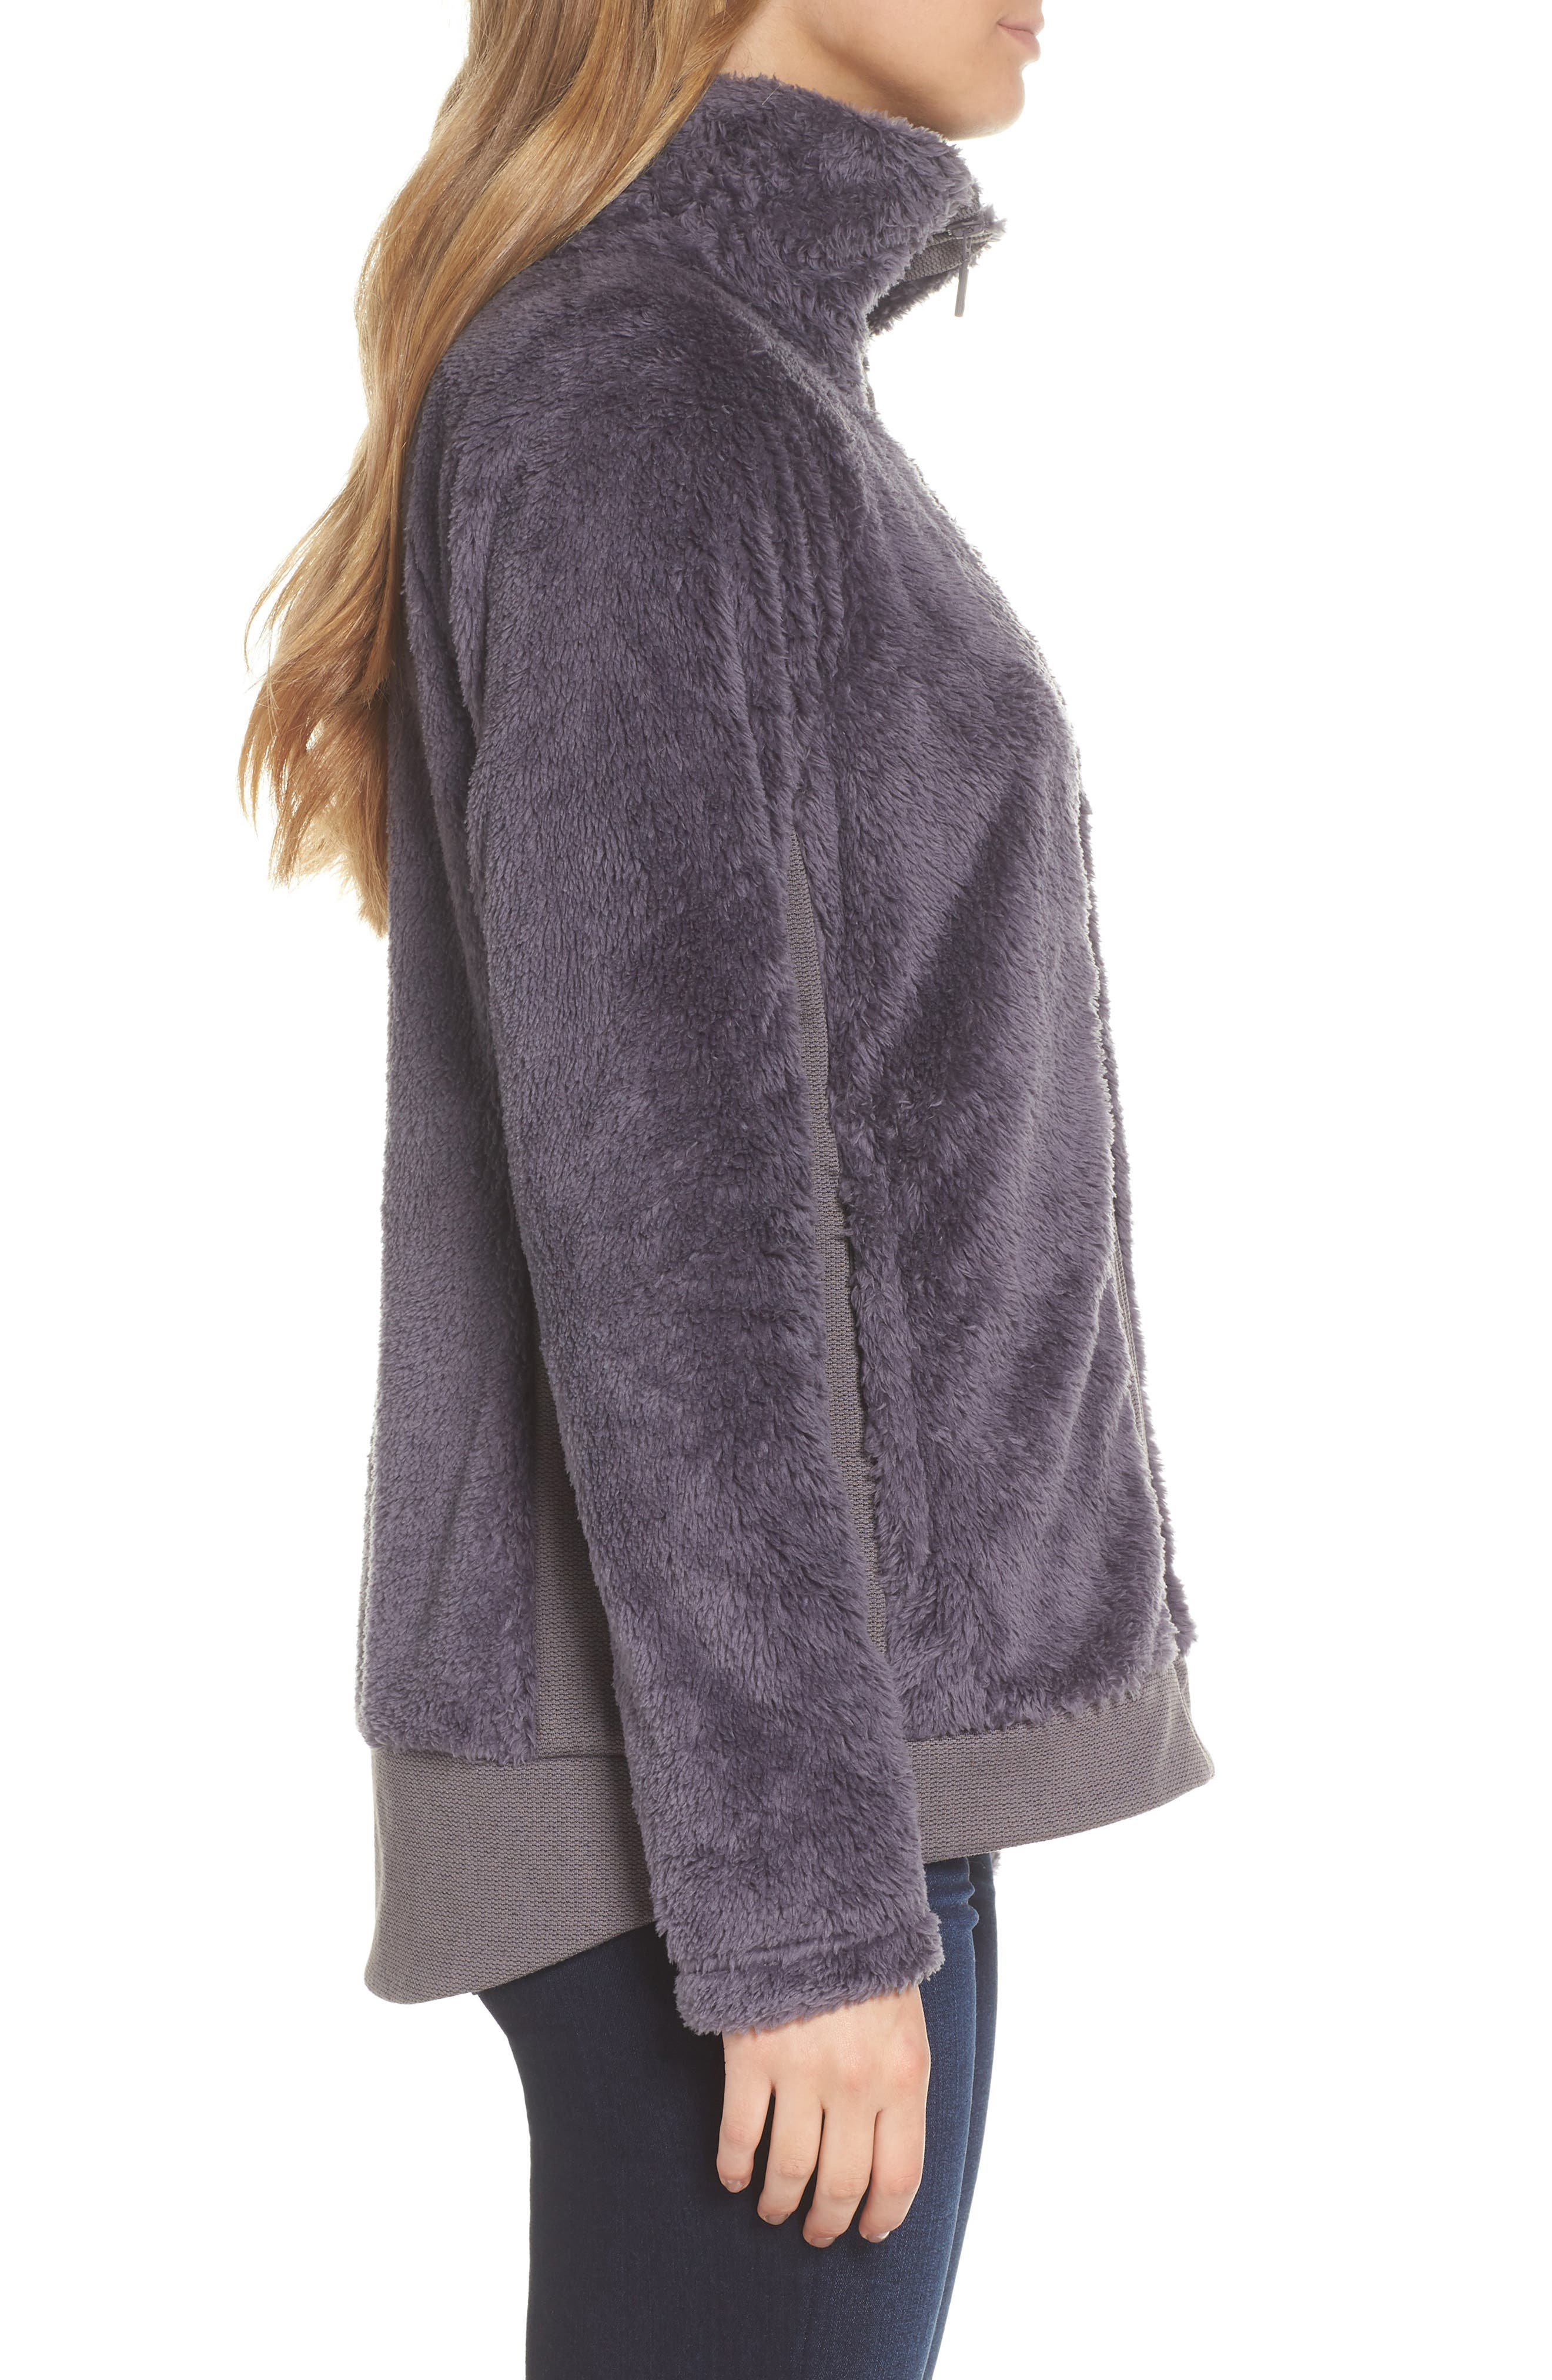 Furry Fleece Jacket,                             Alternate thumbnail 3, color,                             021